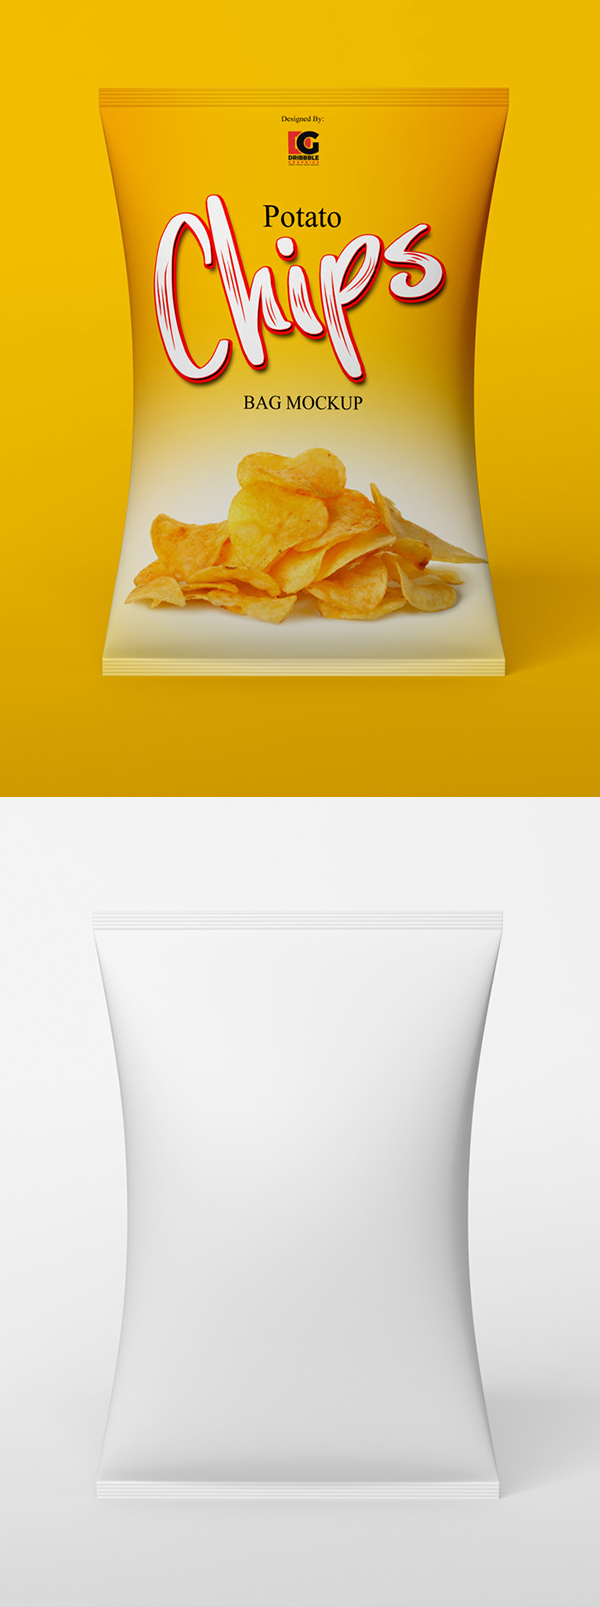 Free Chips Bag Mockup PSD Template